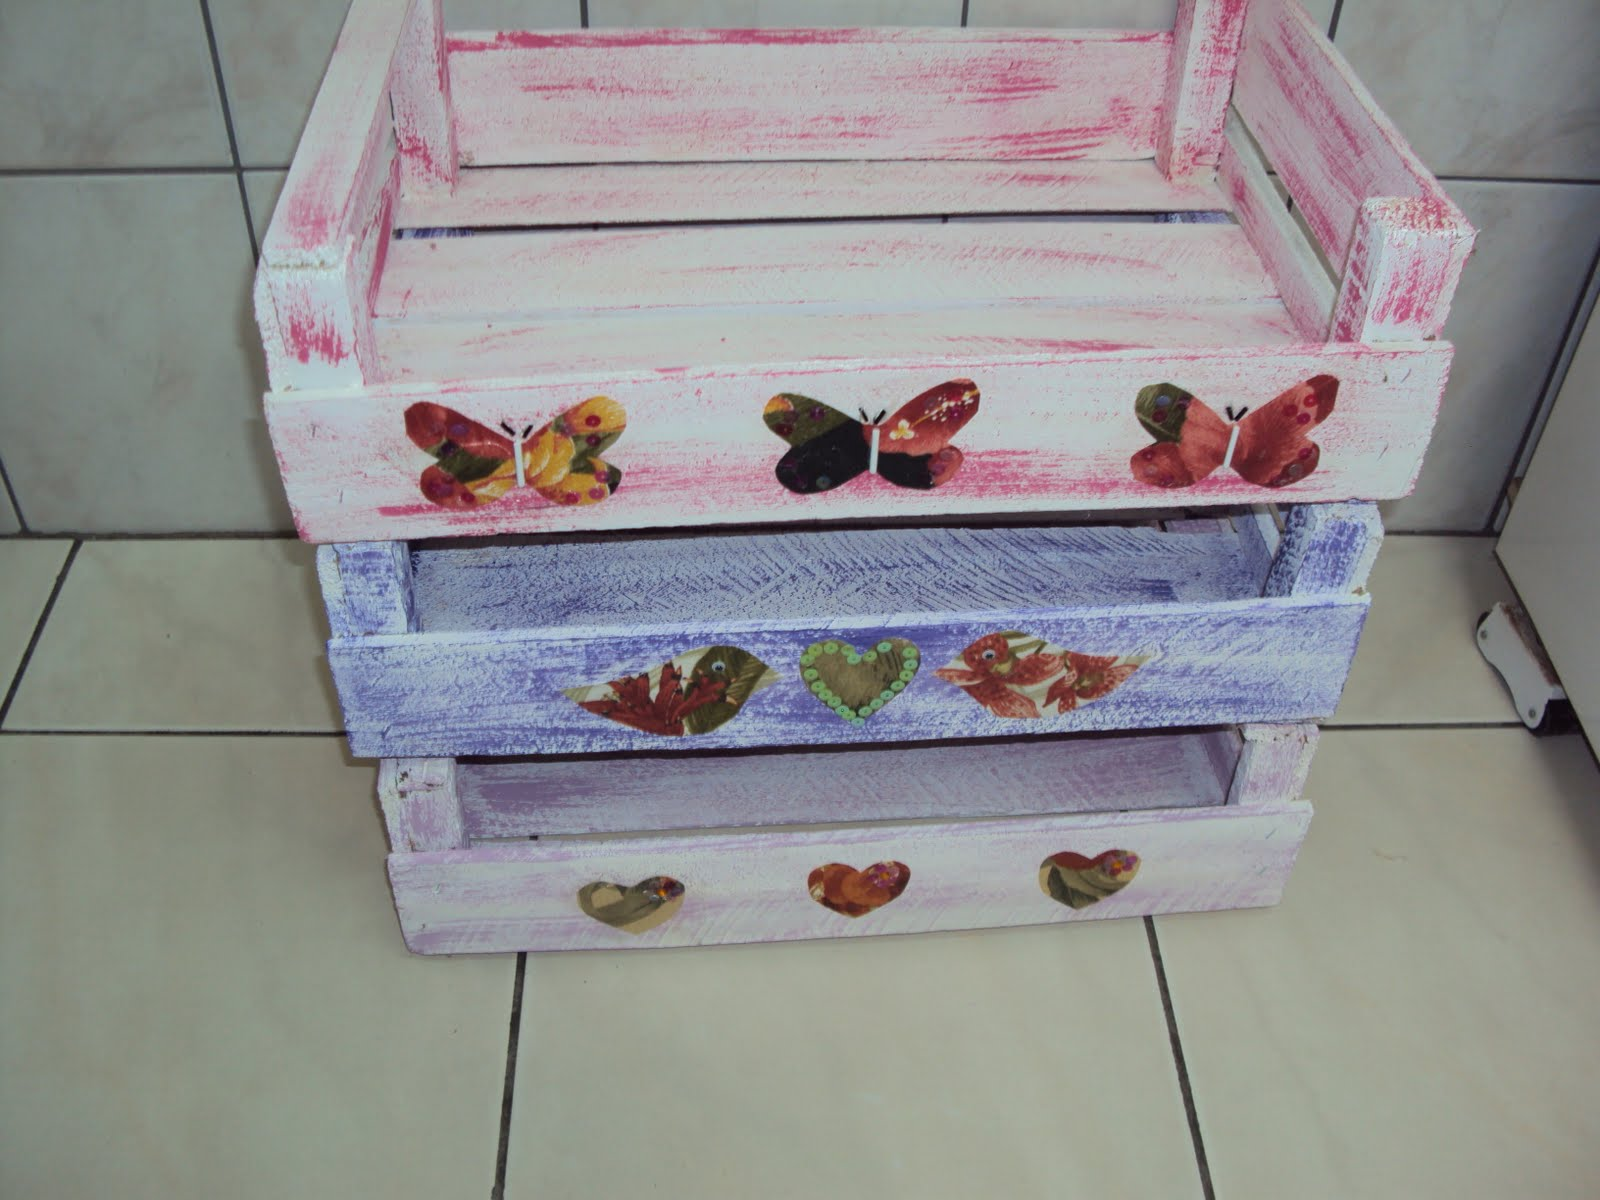 caixotes de feira #723937 1600x1200